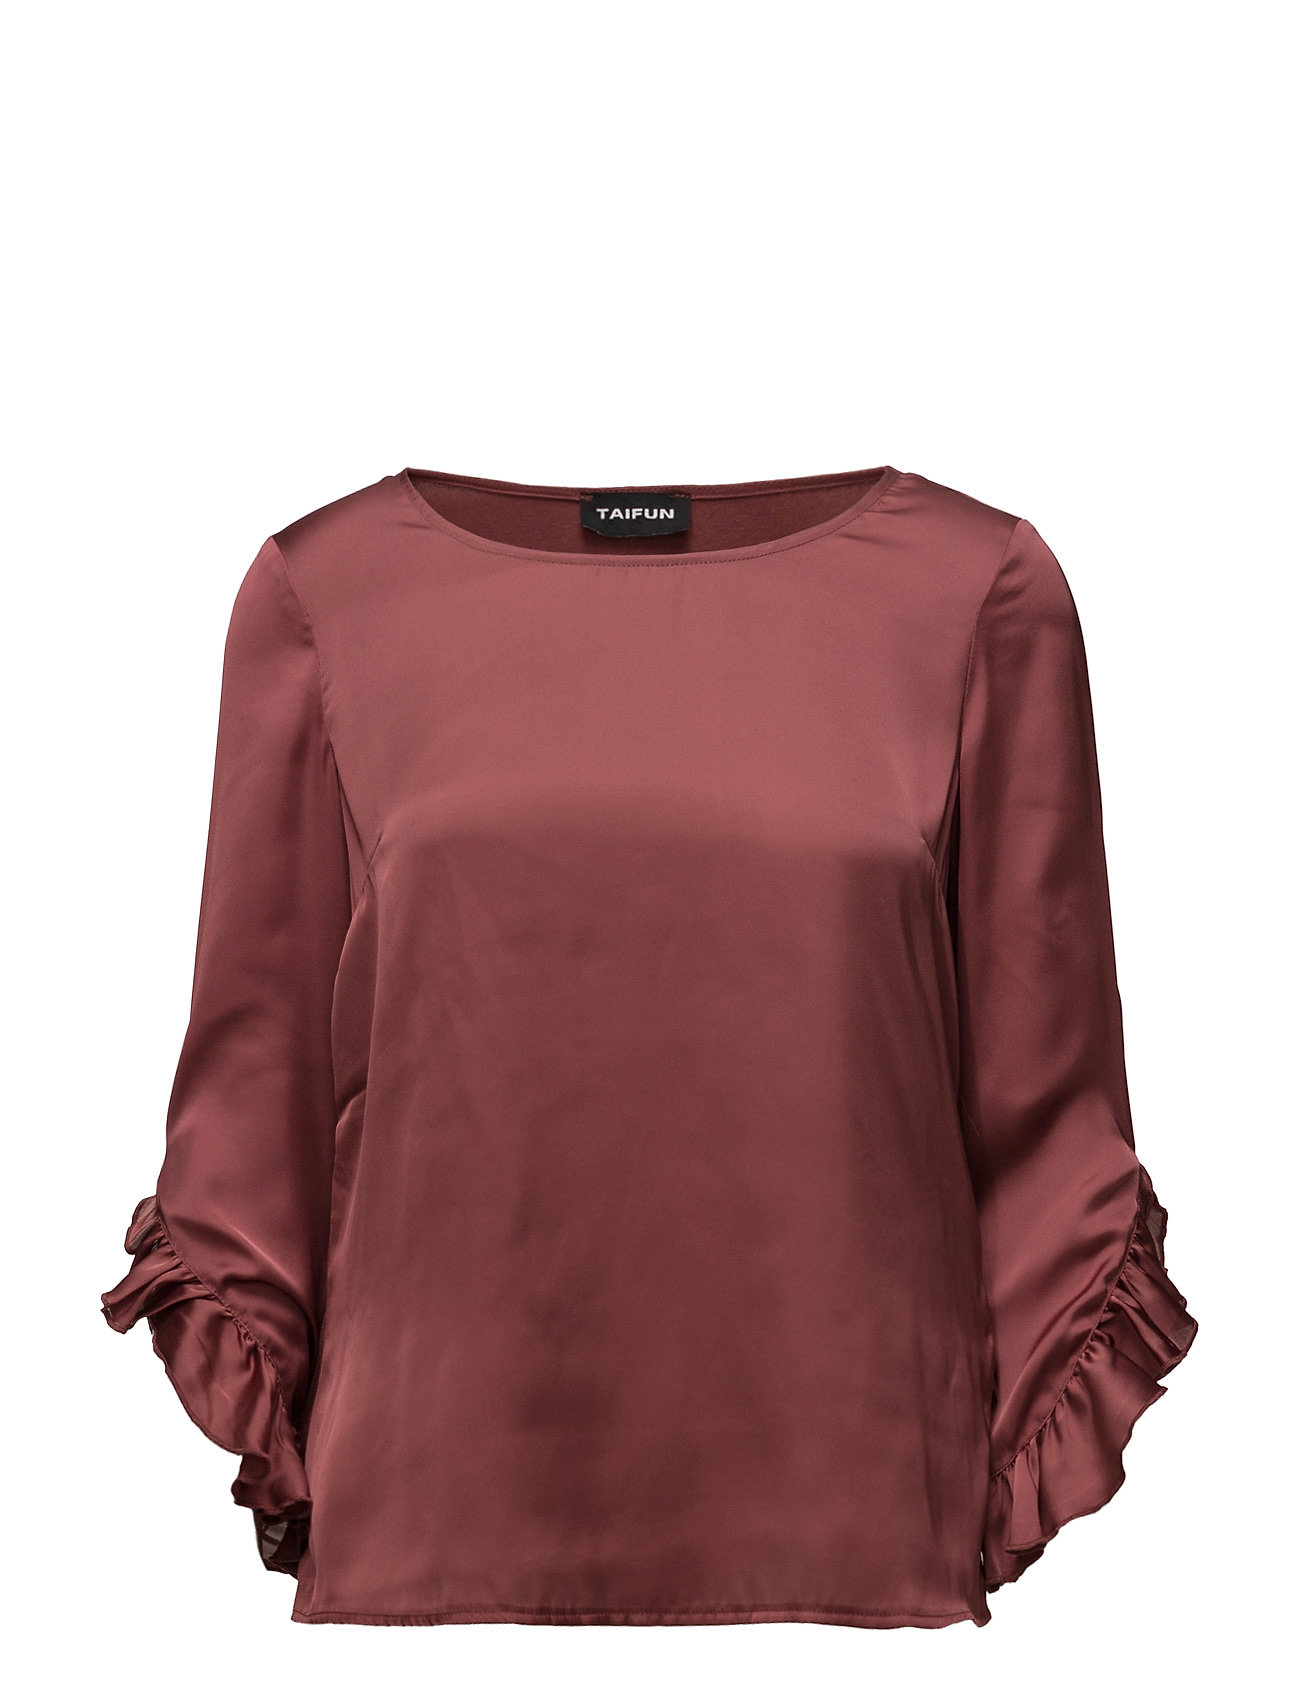 taifun – Polo shirt 3/4 sleev fra boozt.com dk